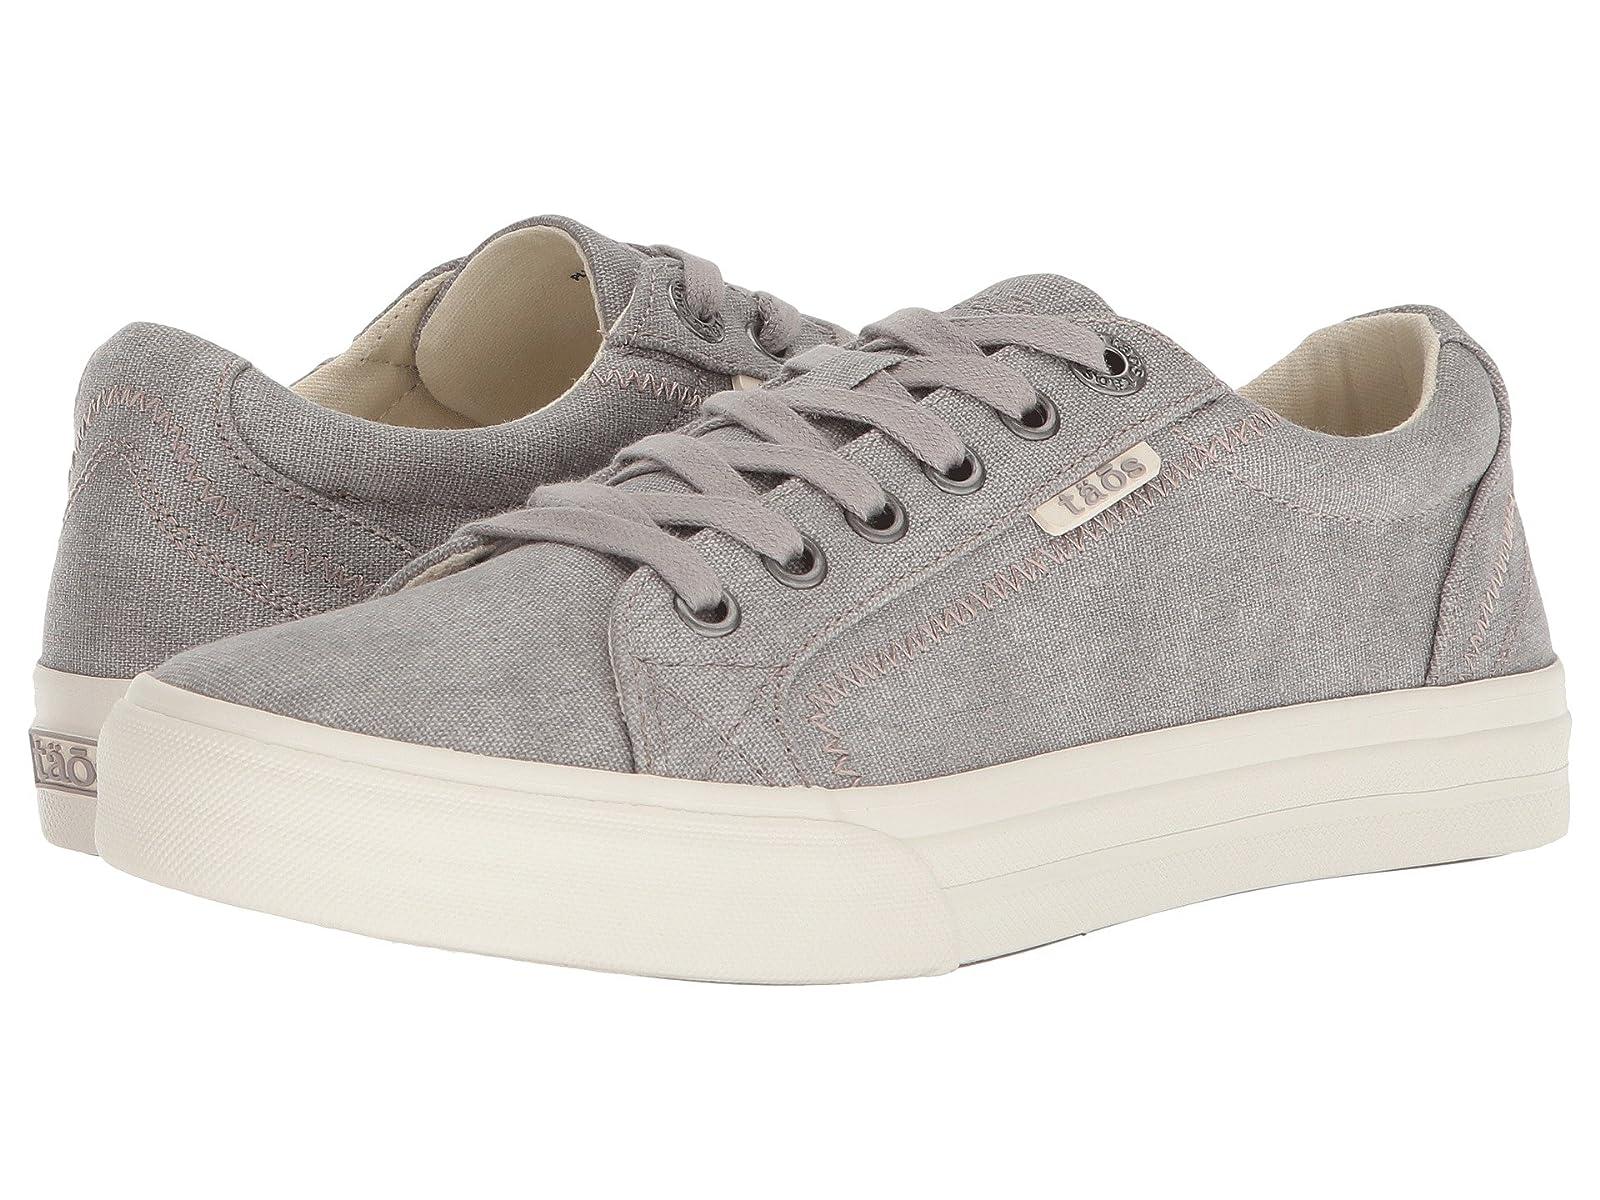 Taos Footwear Plim SoulAtmospheric grades have affordable shoes